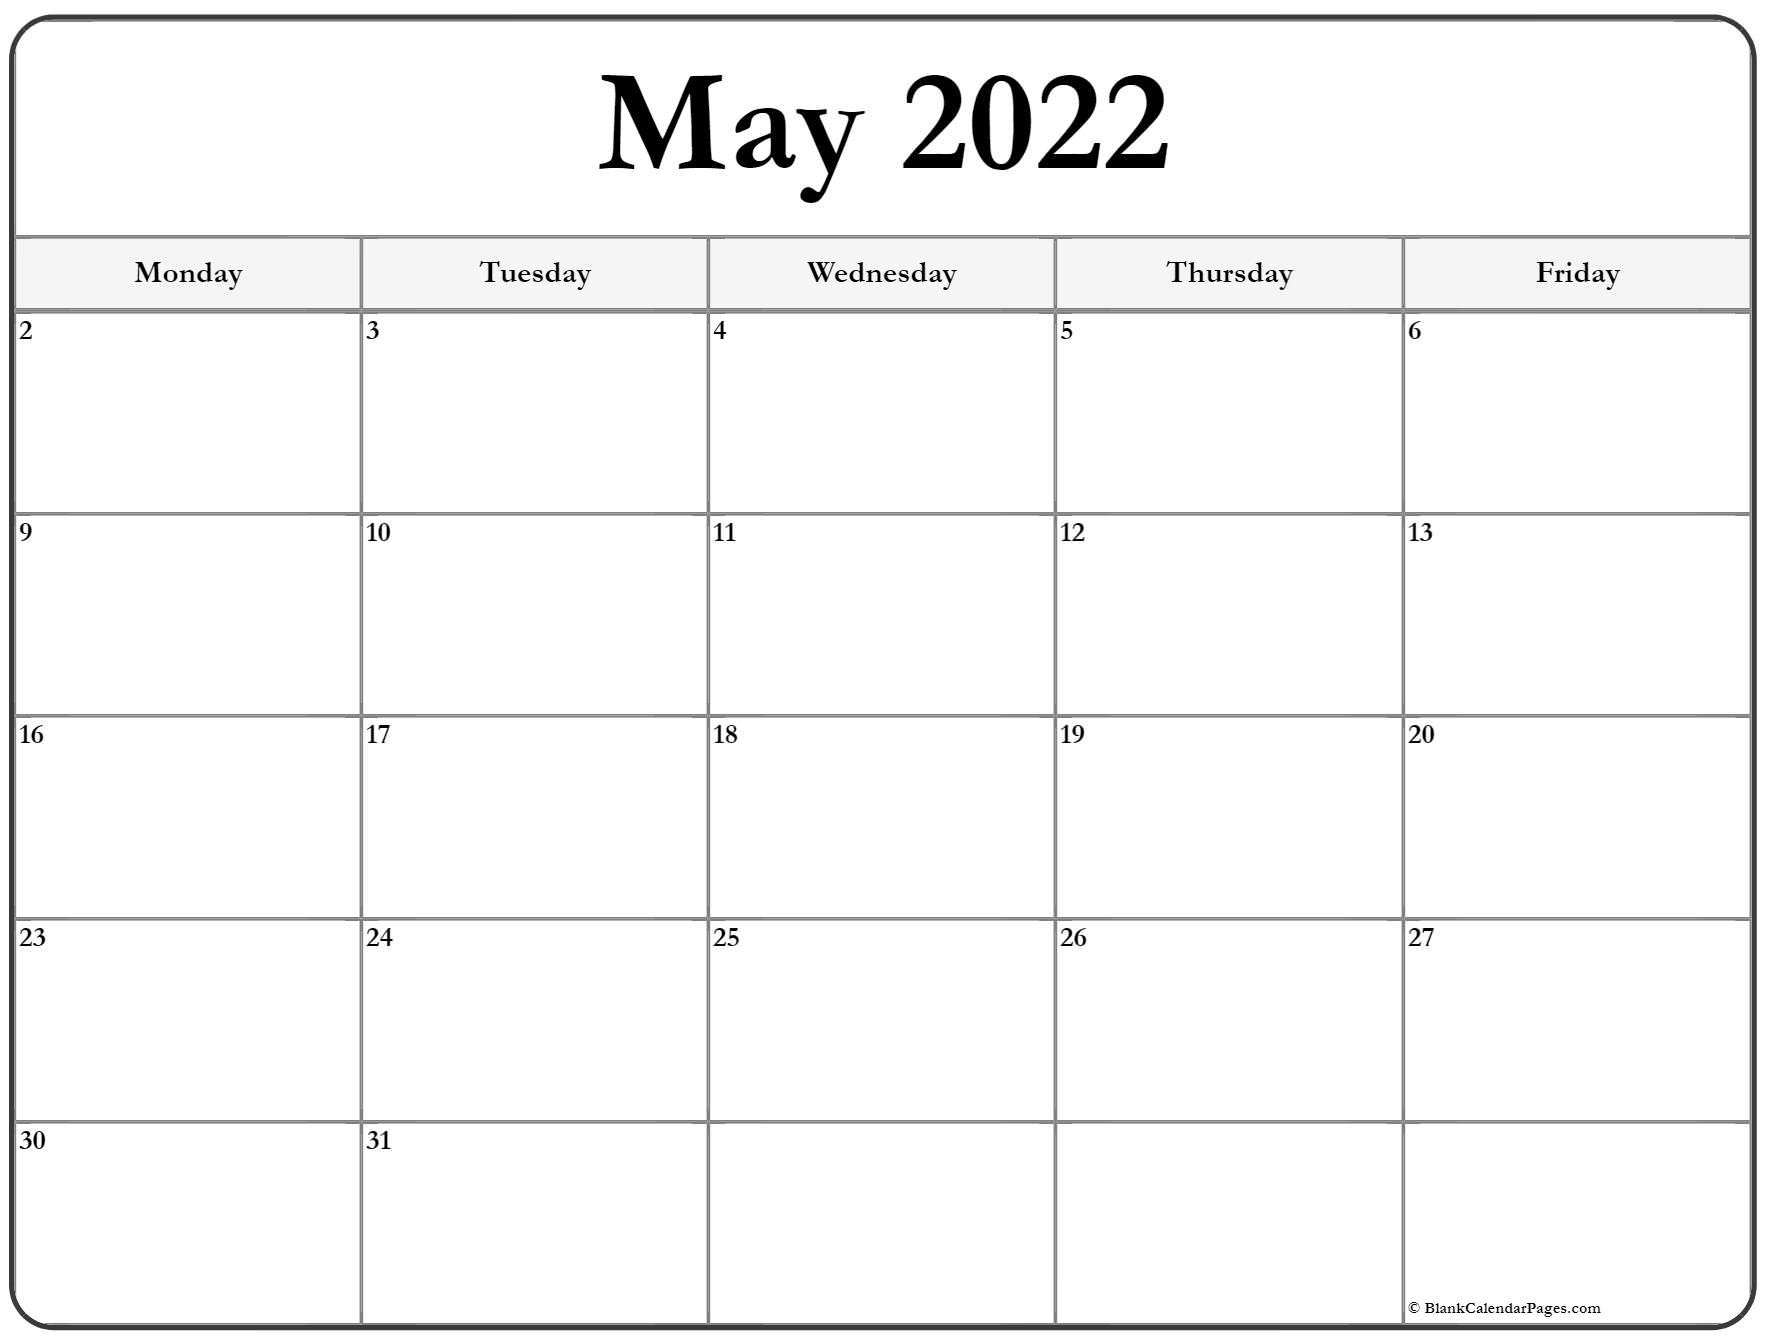 May 2022 Monday Calendar | Monday To Sunday Monday Through Friday Calendar